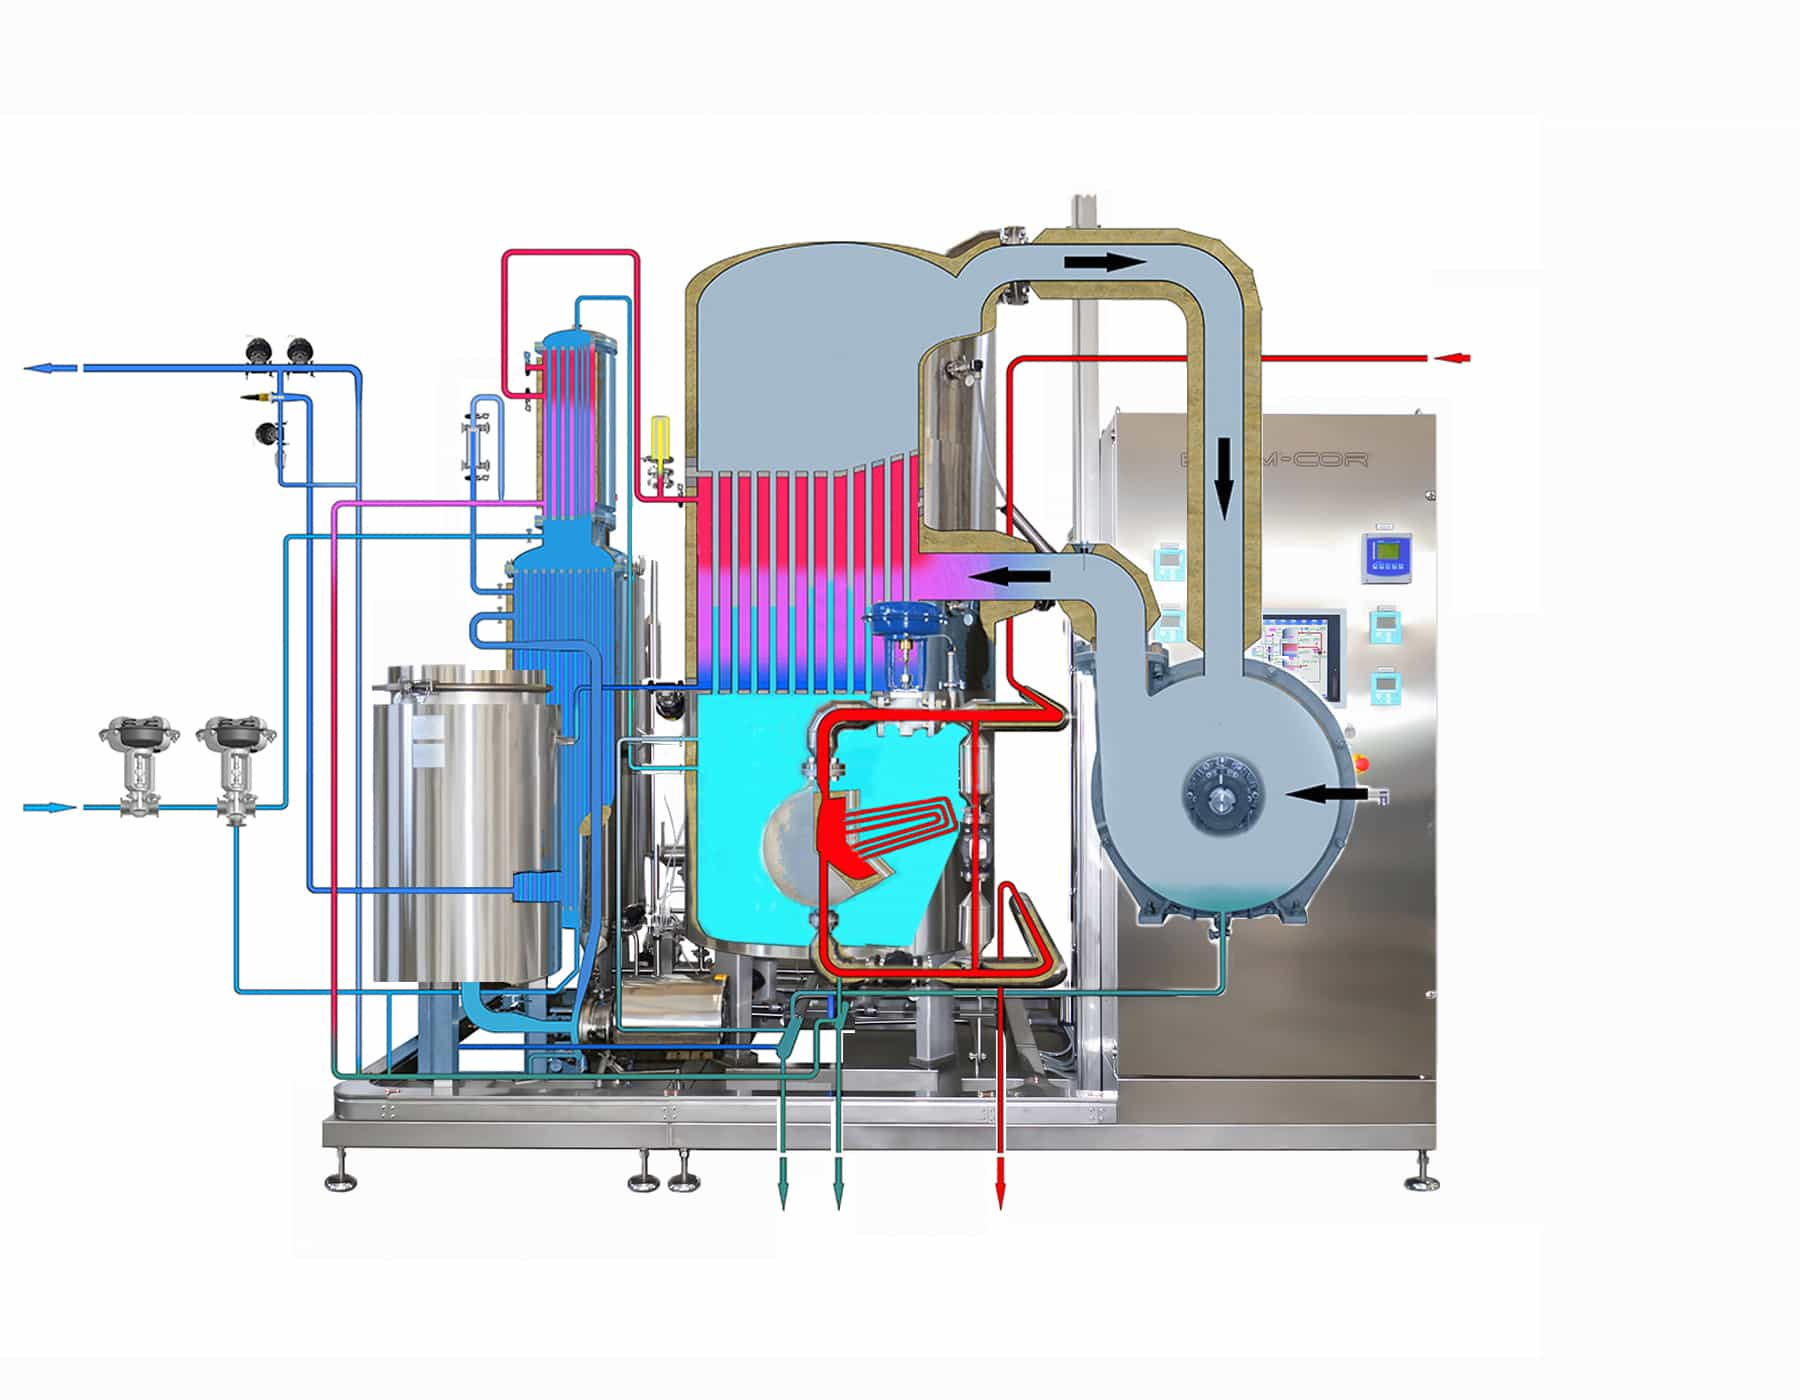 Vapor Compression Distillation process - Step 7-8